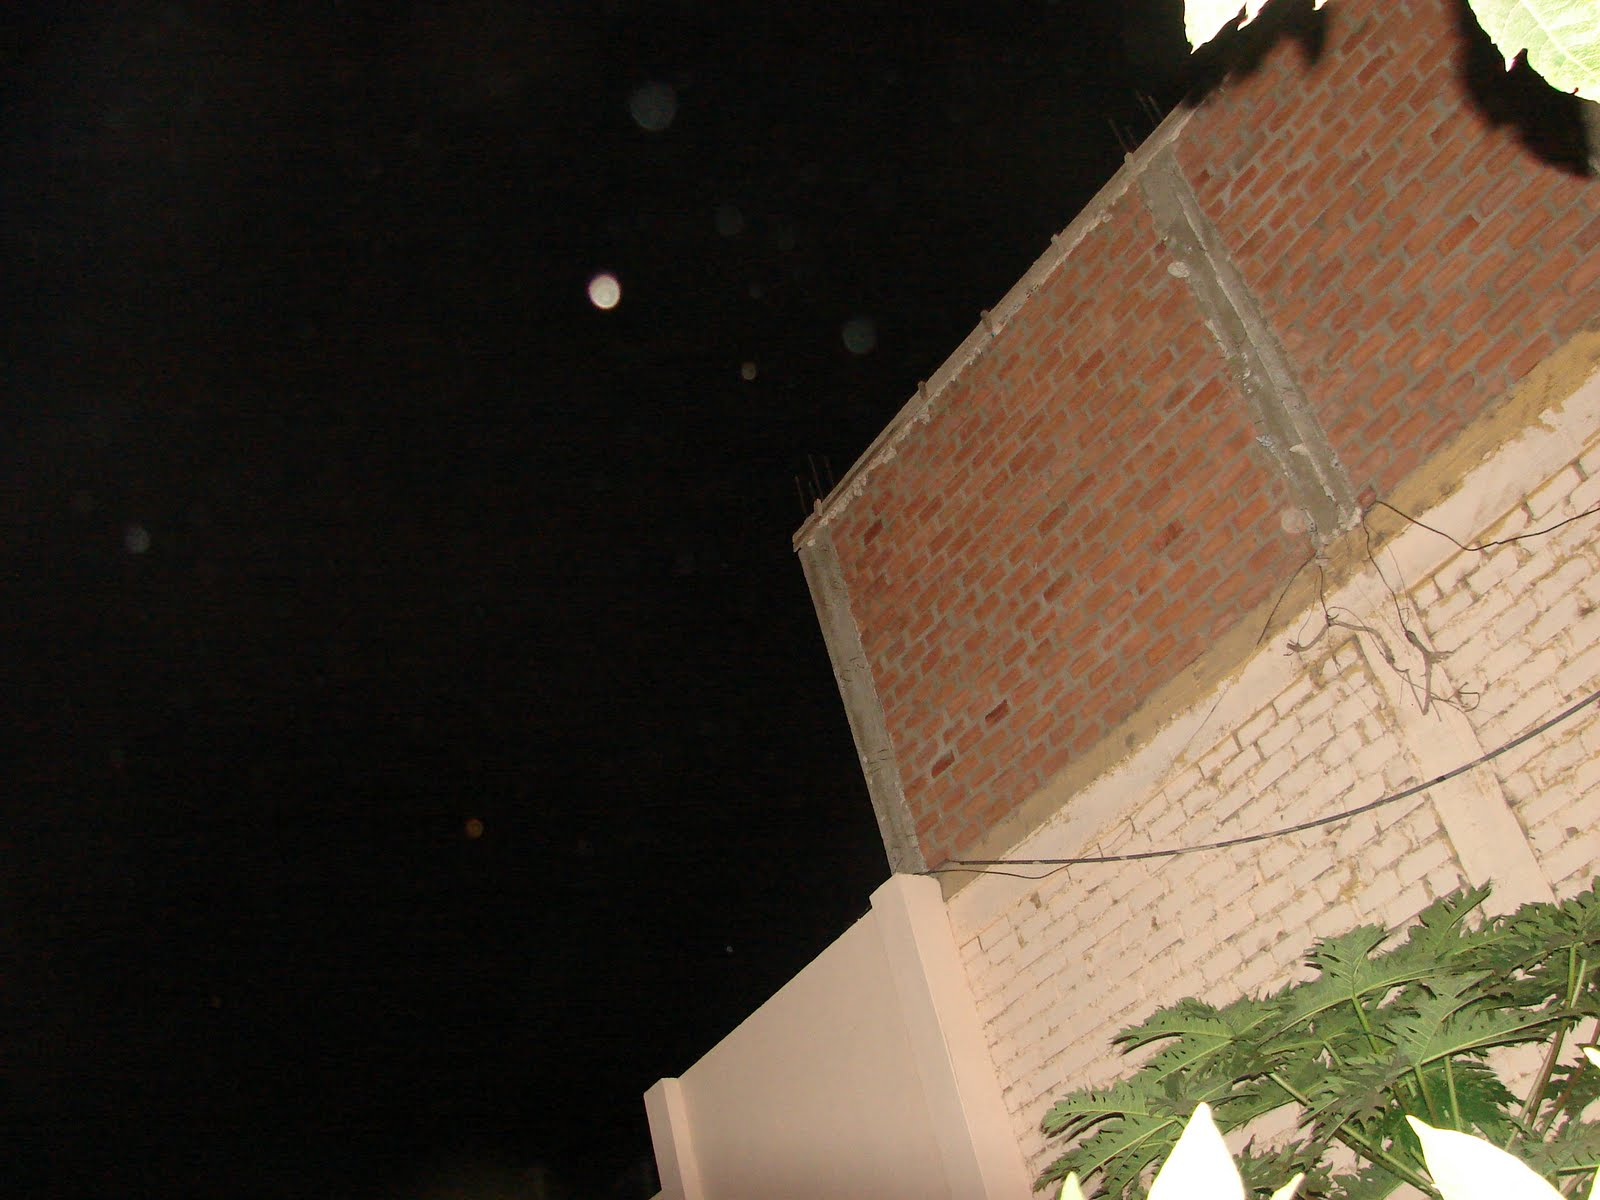 11-mayo-12-13-14...2011 sec avistamientos Ovnis Caneplas de LUZ...